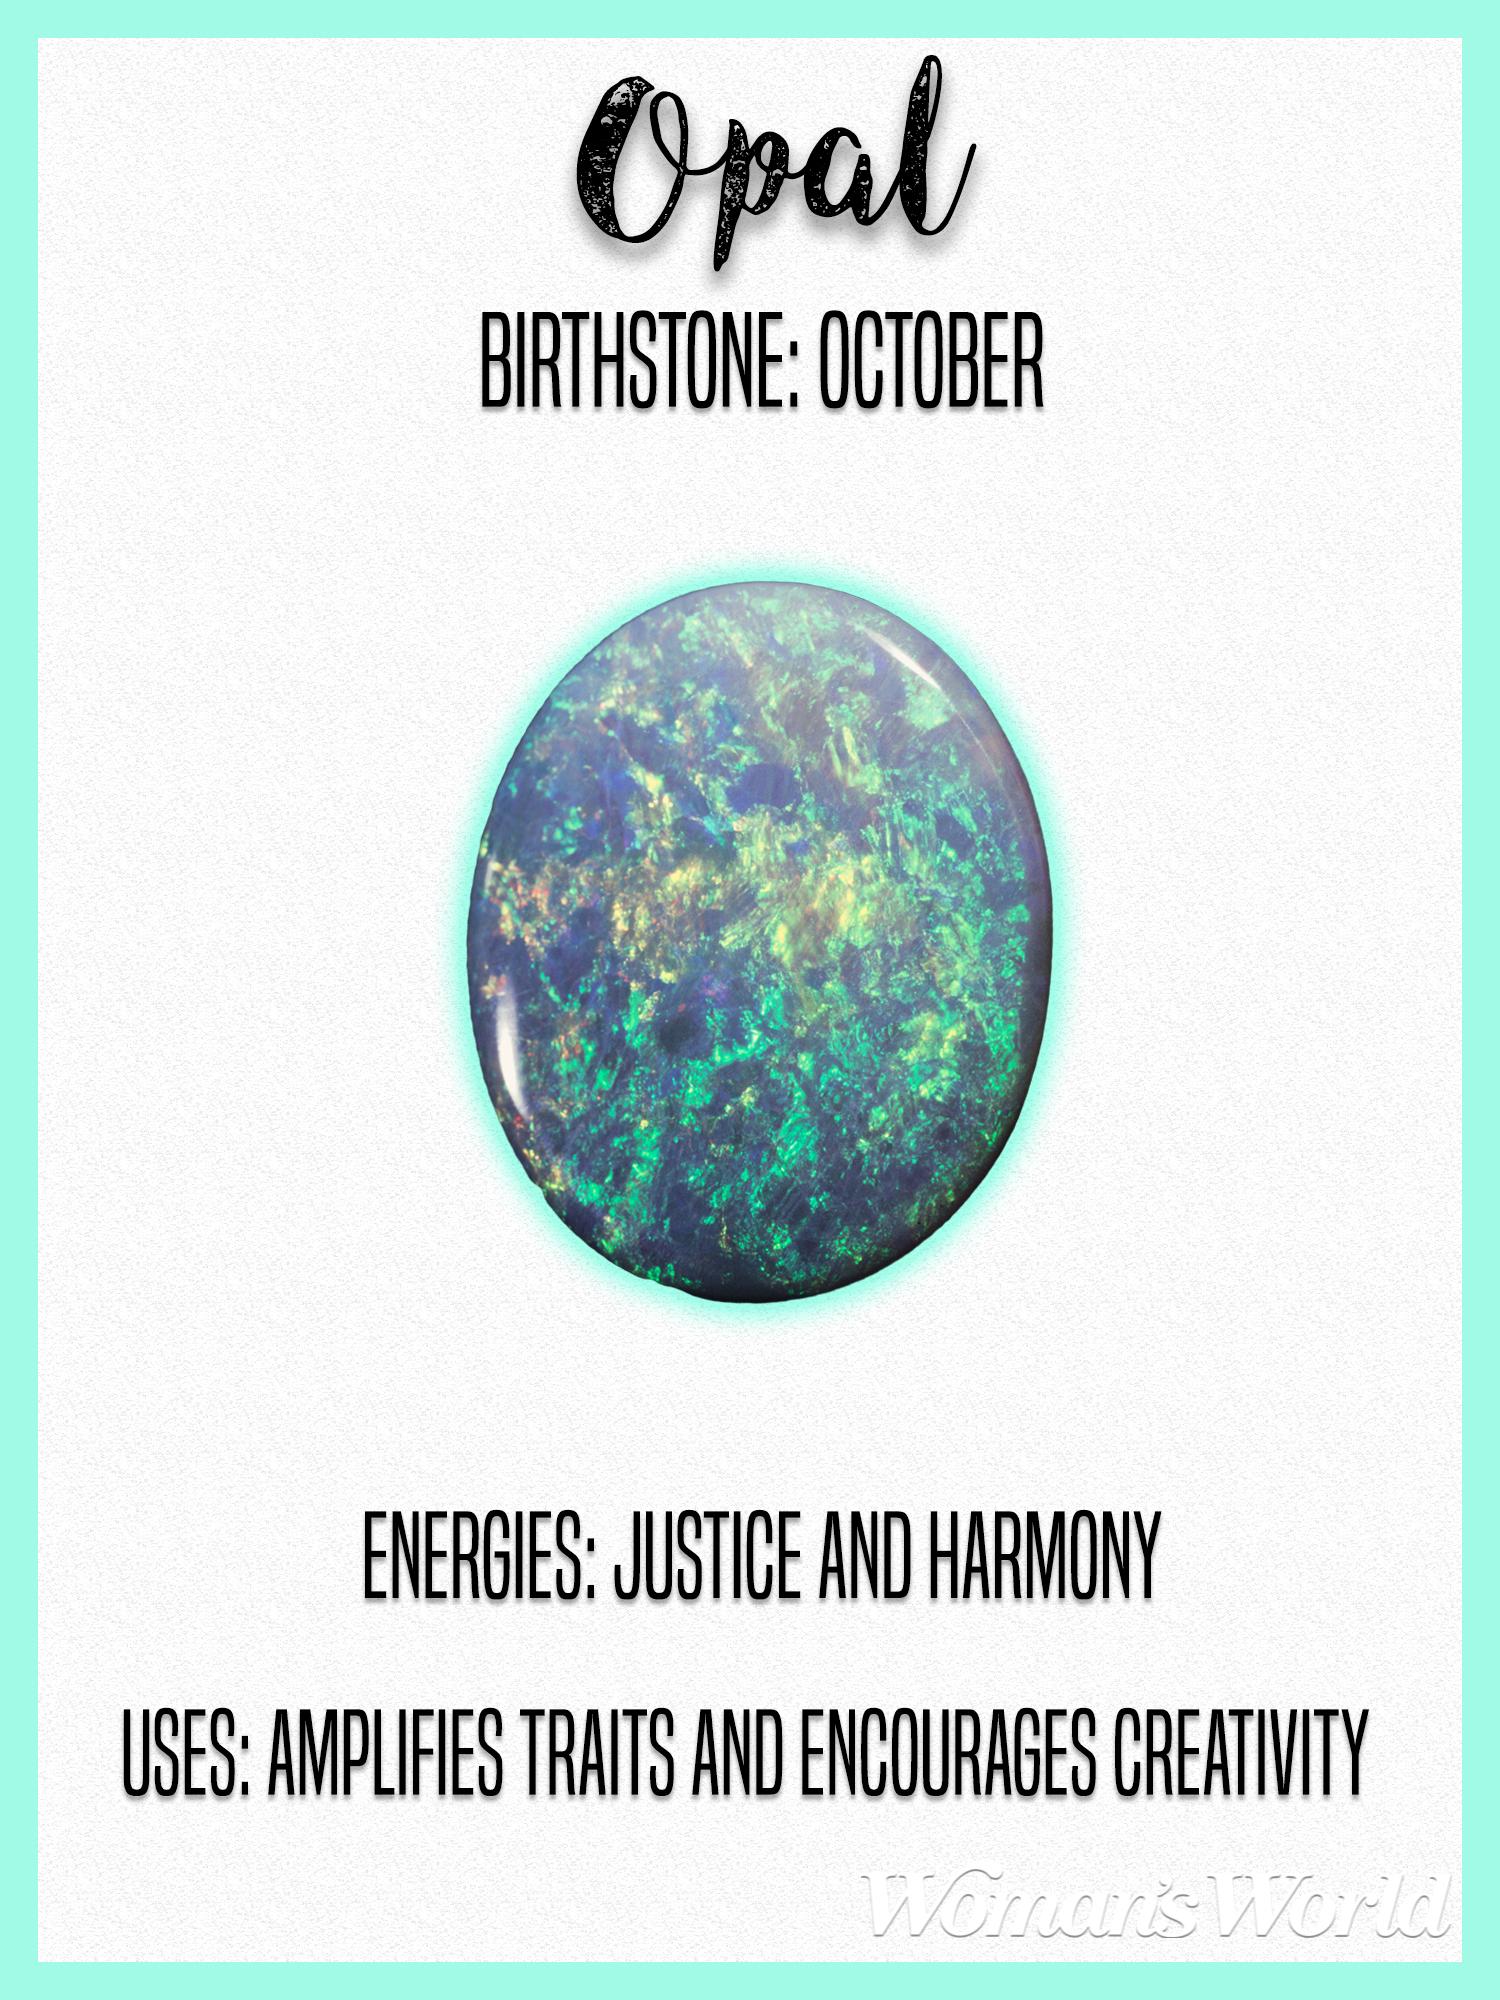 opal gemstone meaning